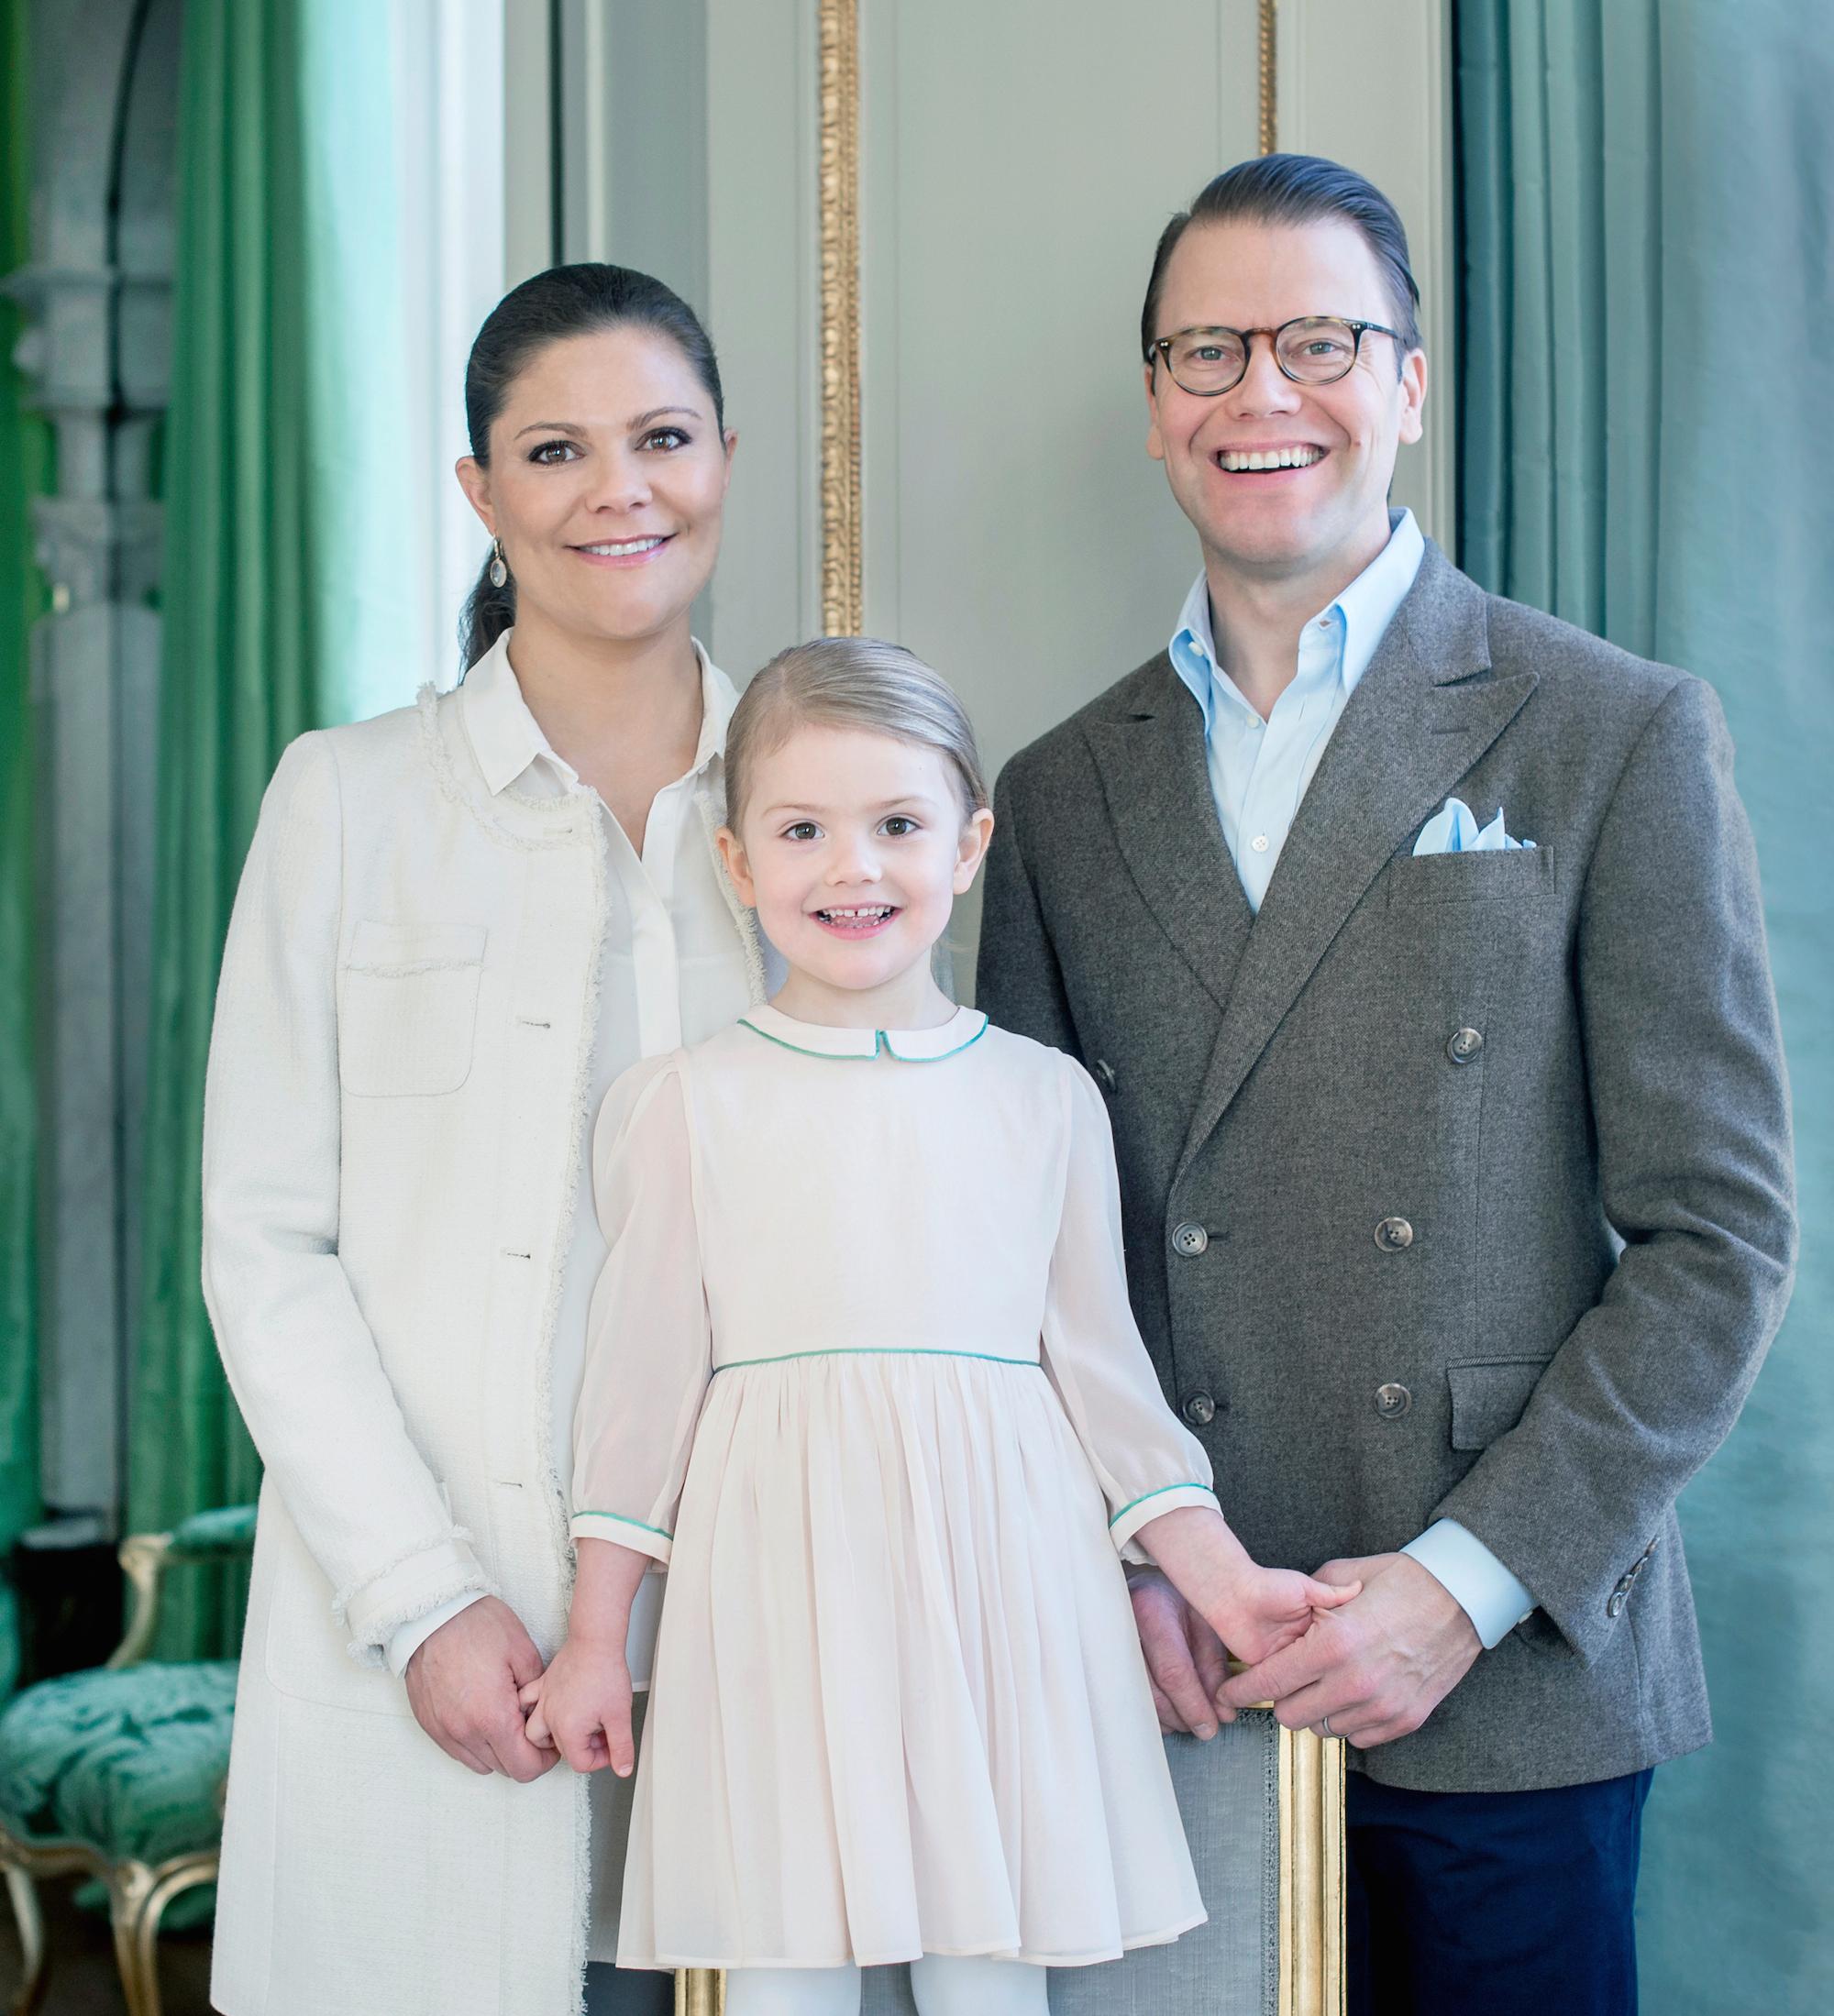 H.K.H. Kronprinsessan Victoria / H.R.H. Crown Princess Victoria / H.K.H. Prins Daniel / H.R.H. Prince Daniel / H.K.H. Prinsessan Estelle / H.R.H. Princess Estelle Februari /February 2016